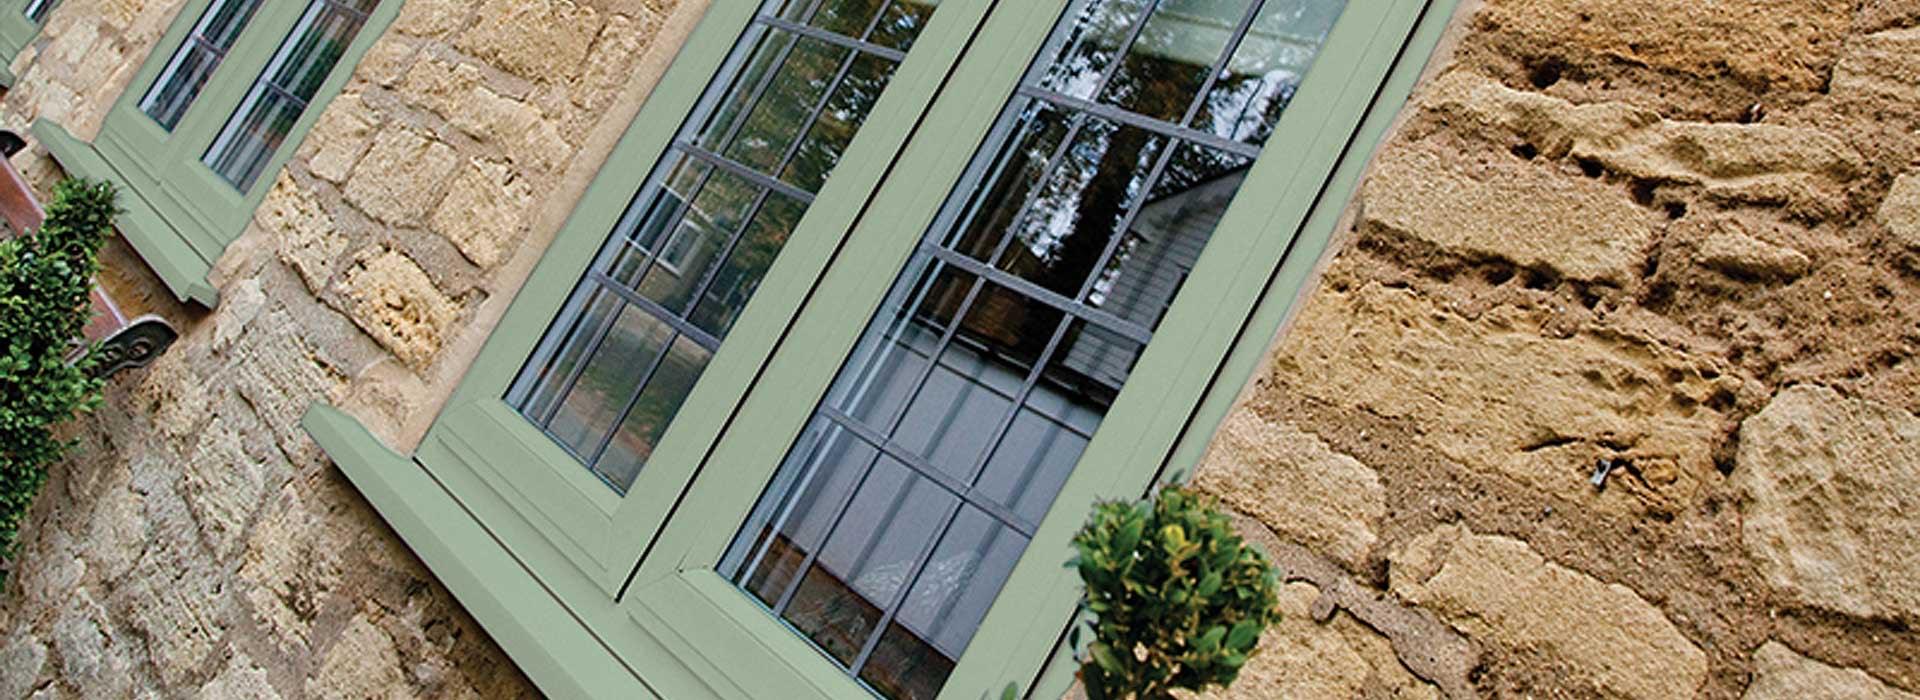 Double Glazing Gillingham